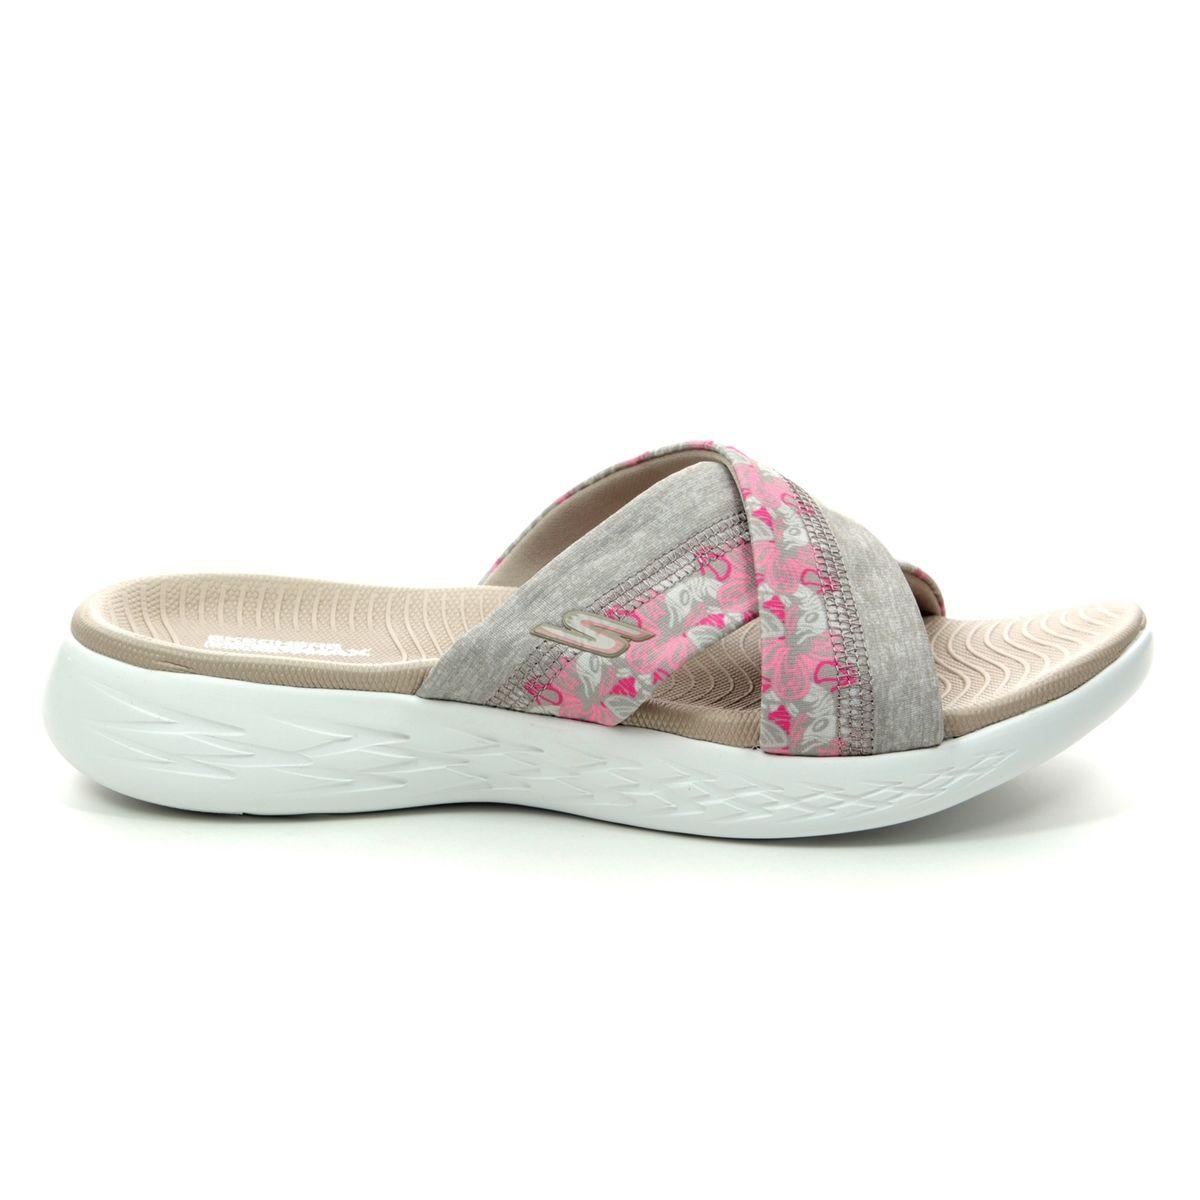 c3f2c3b710a1 Skechers Monarch 600 15306 TPE Taupe Slide Sandals